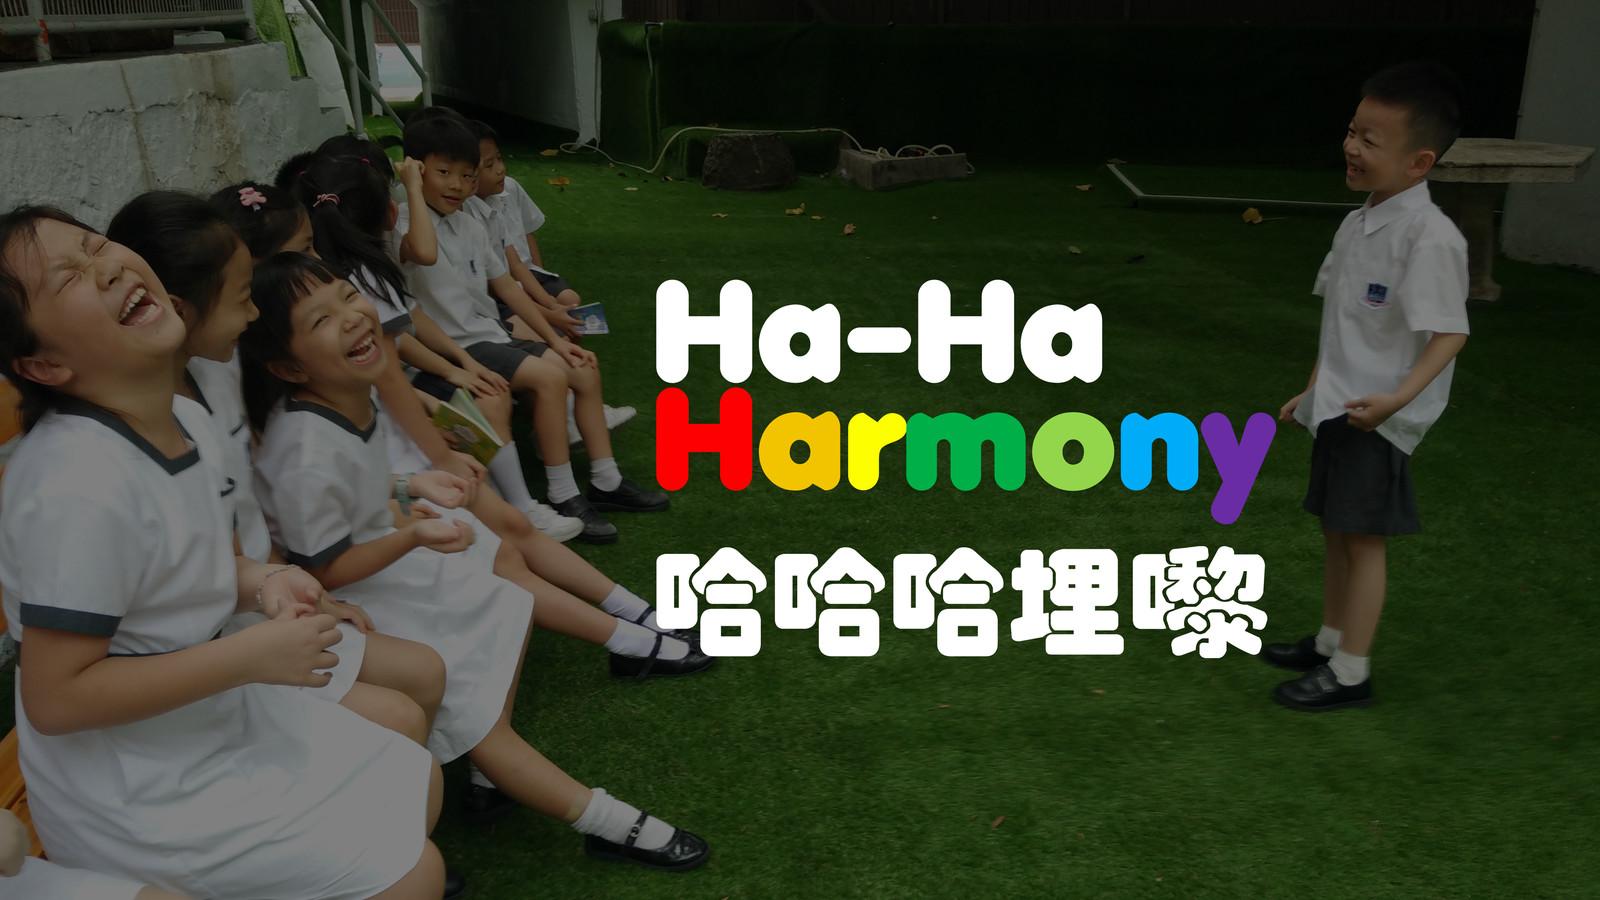 Ha-Ha Harmony (哈哈哈埋嚟)